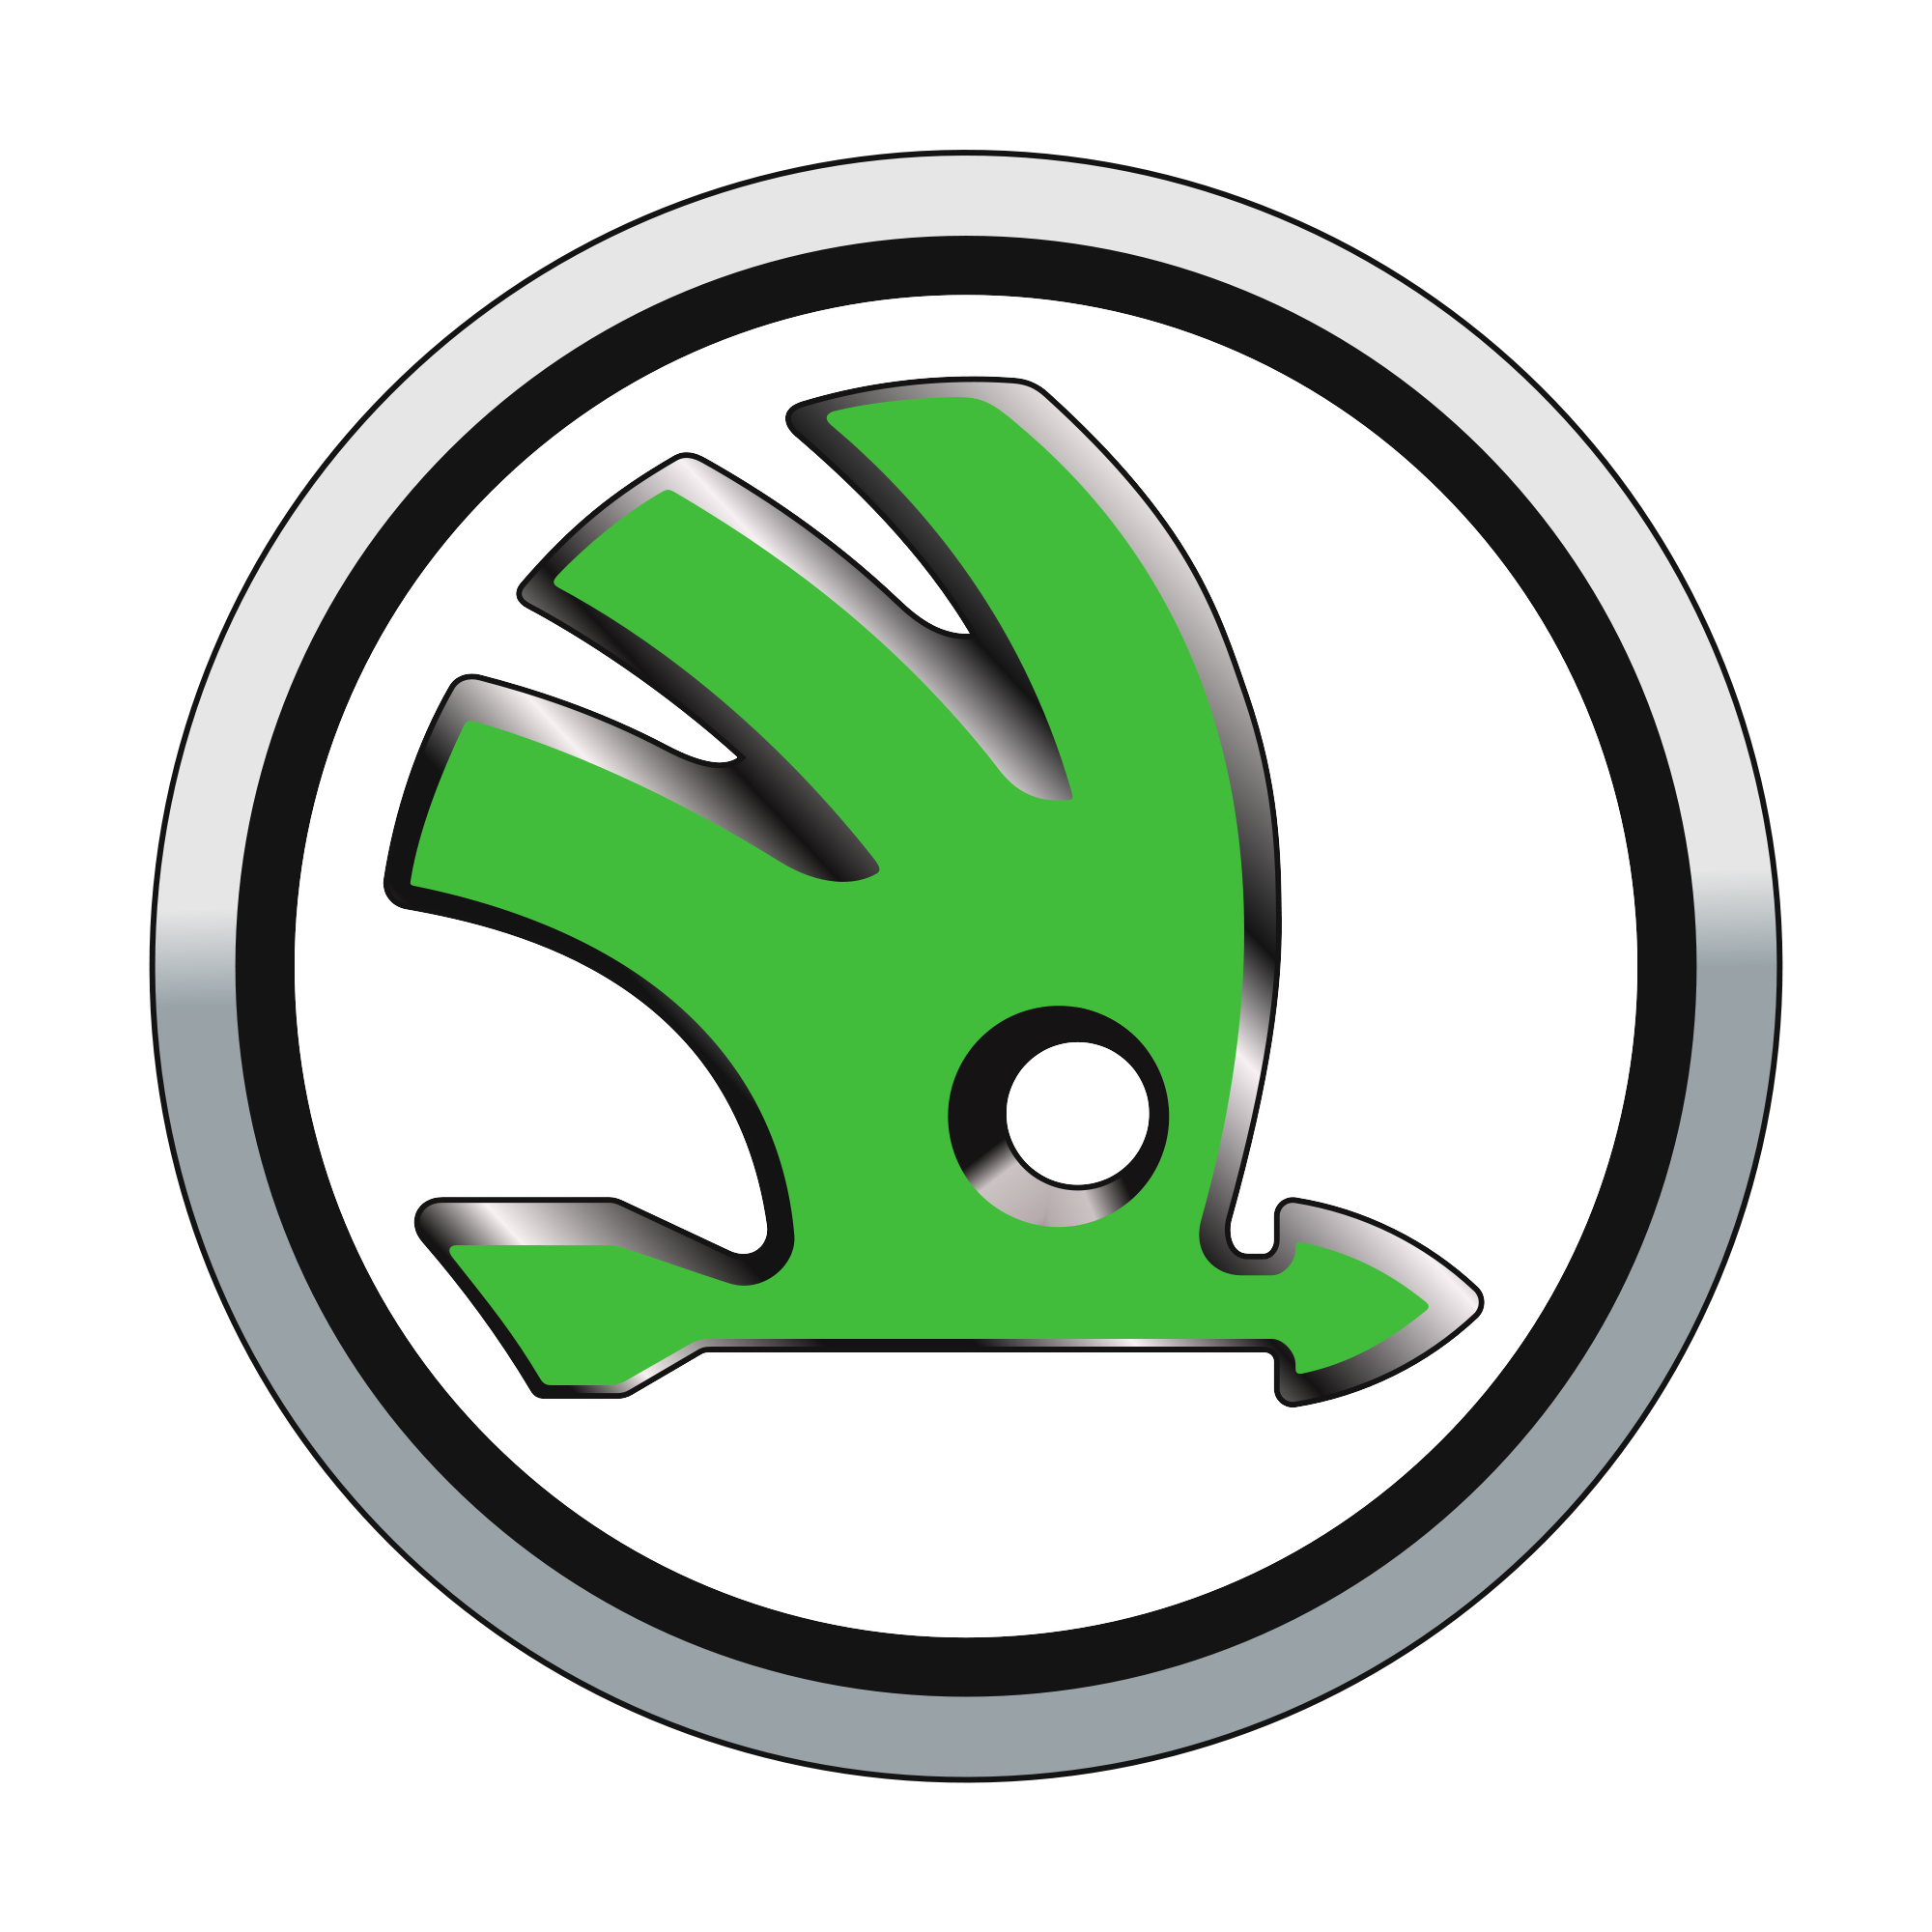 Skoda Logo Skoda Car Symbol Meaning And History